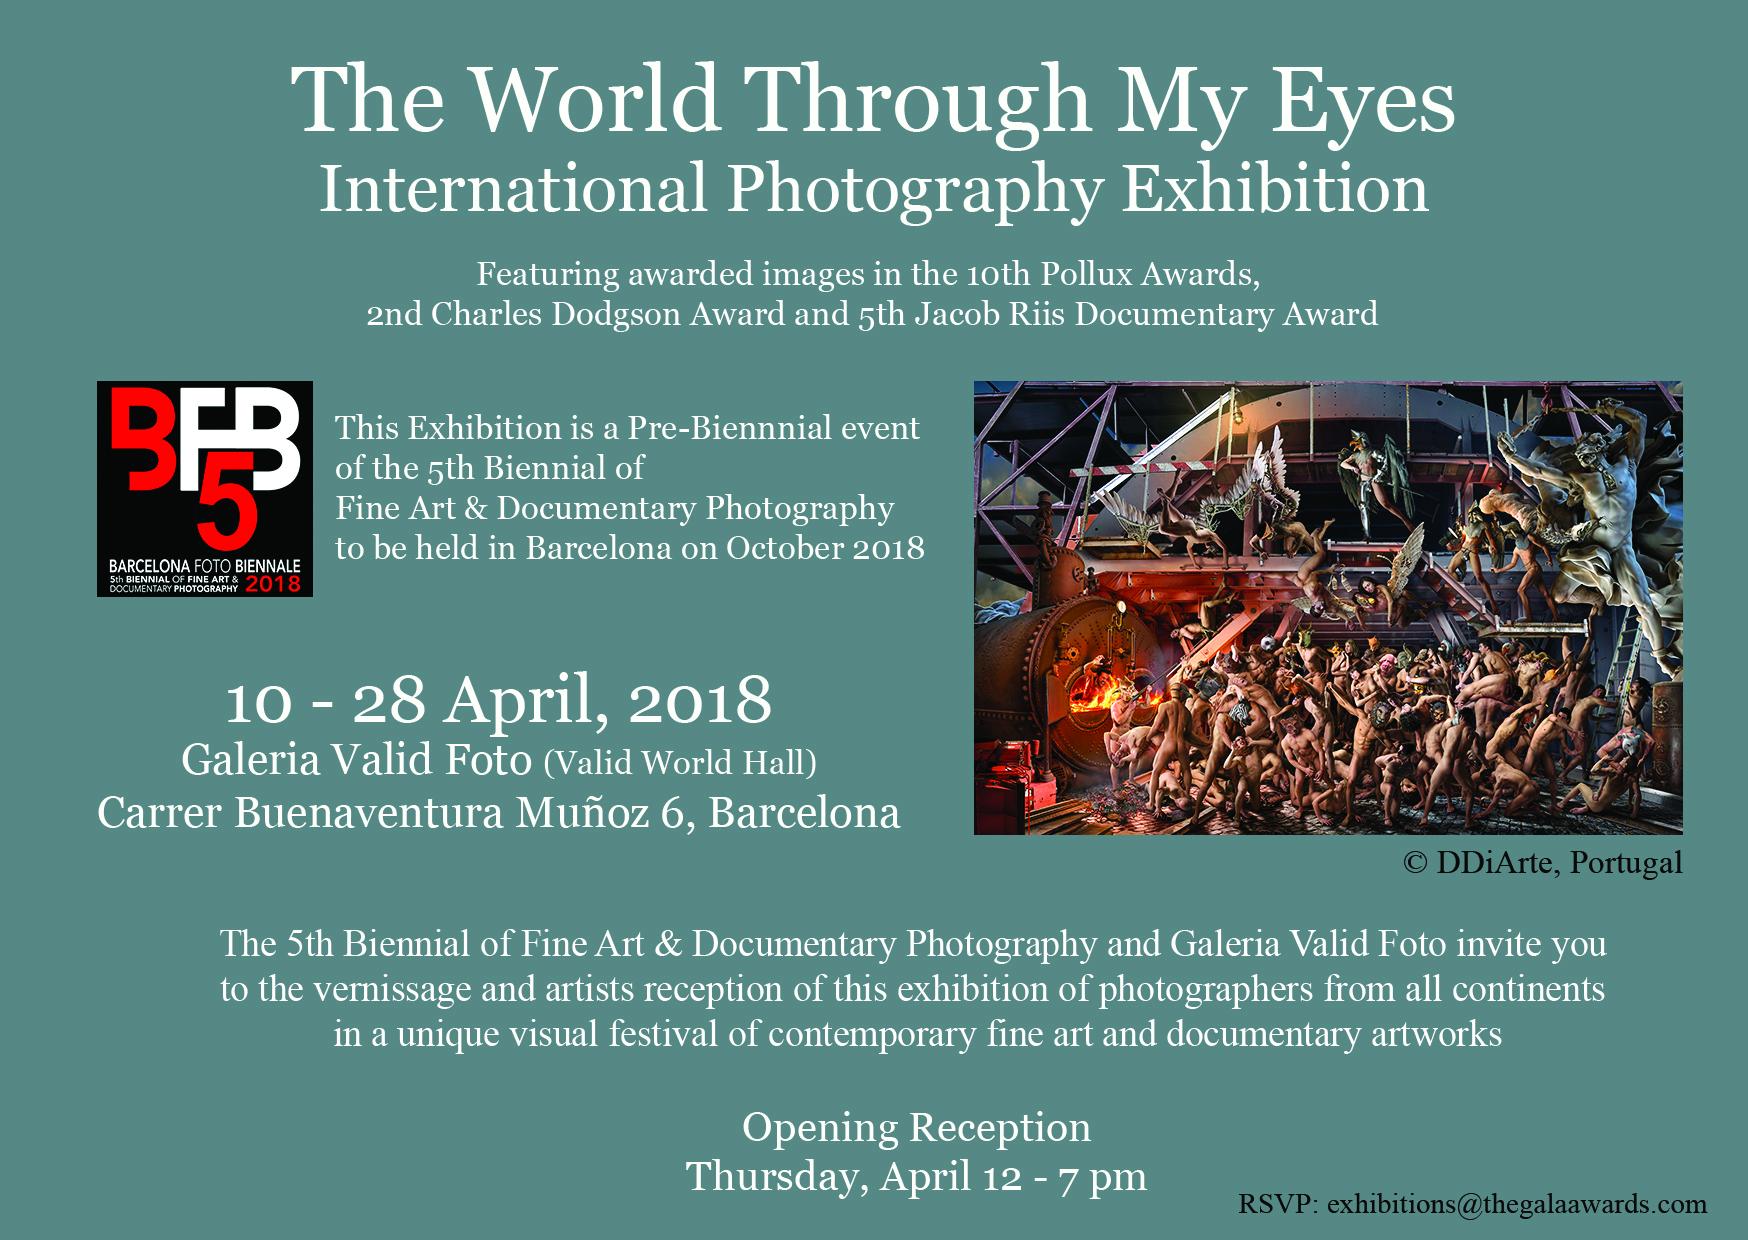 Invitation The World Through My Eyes High Res flat.jpg